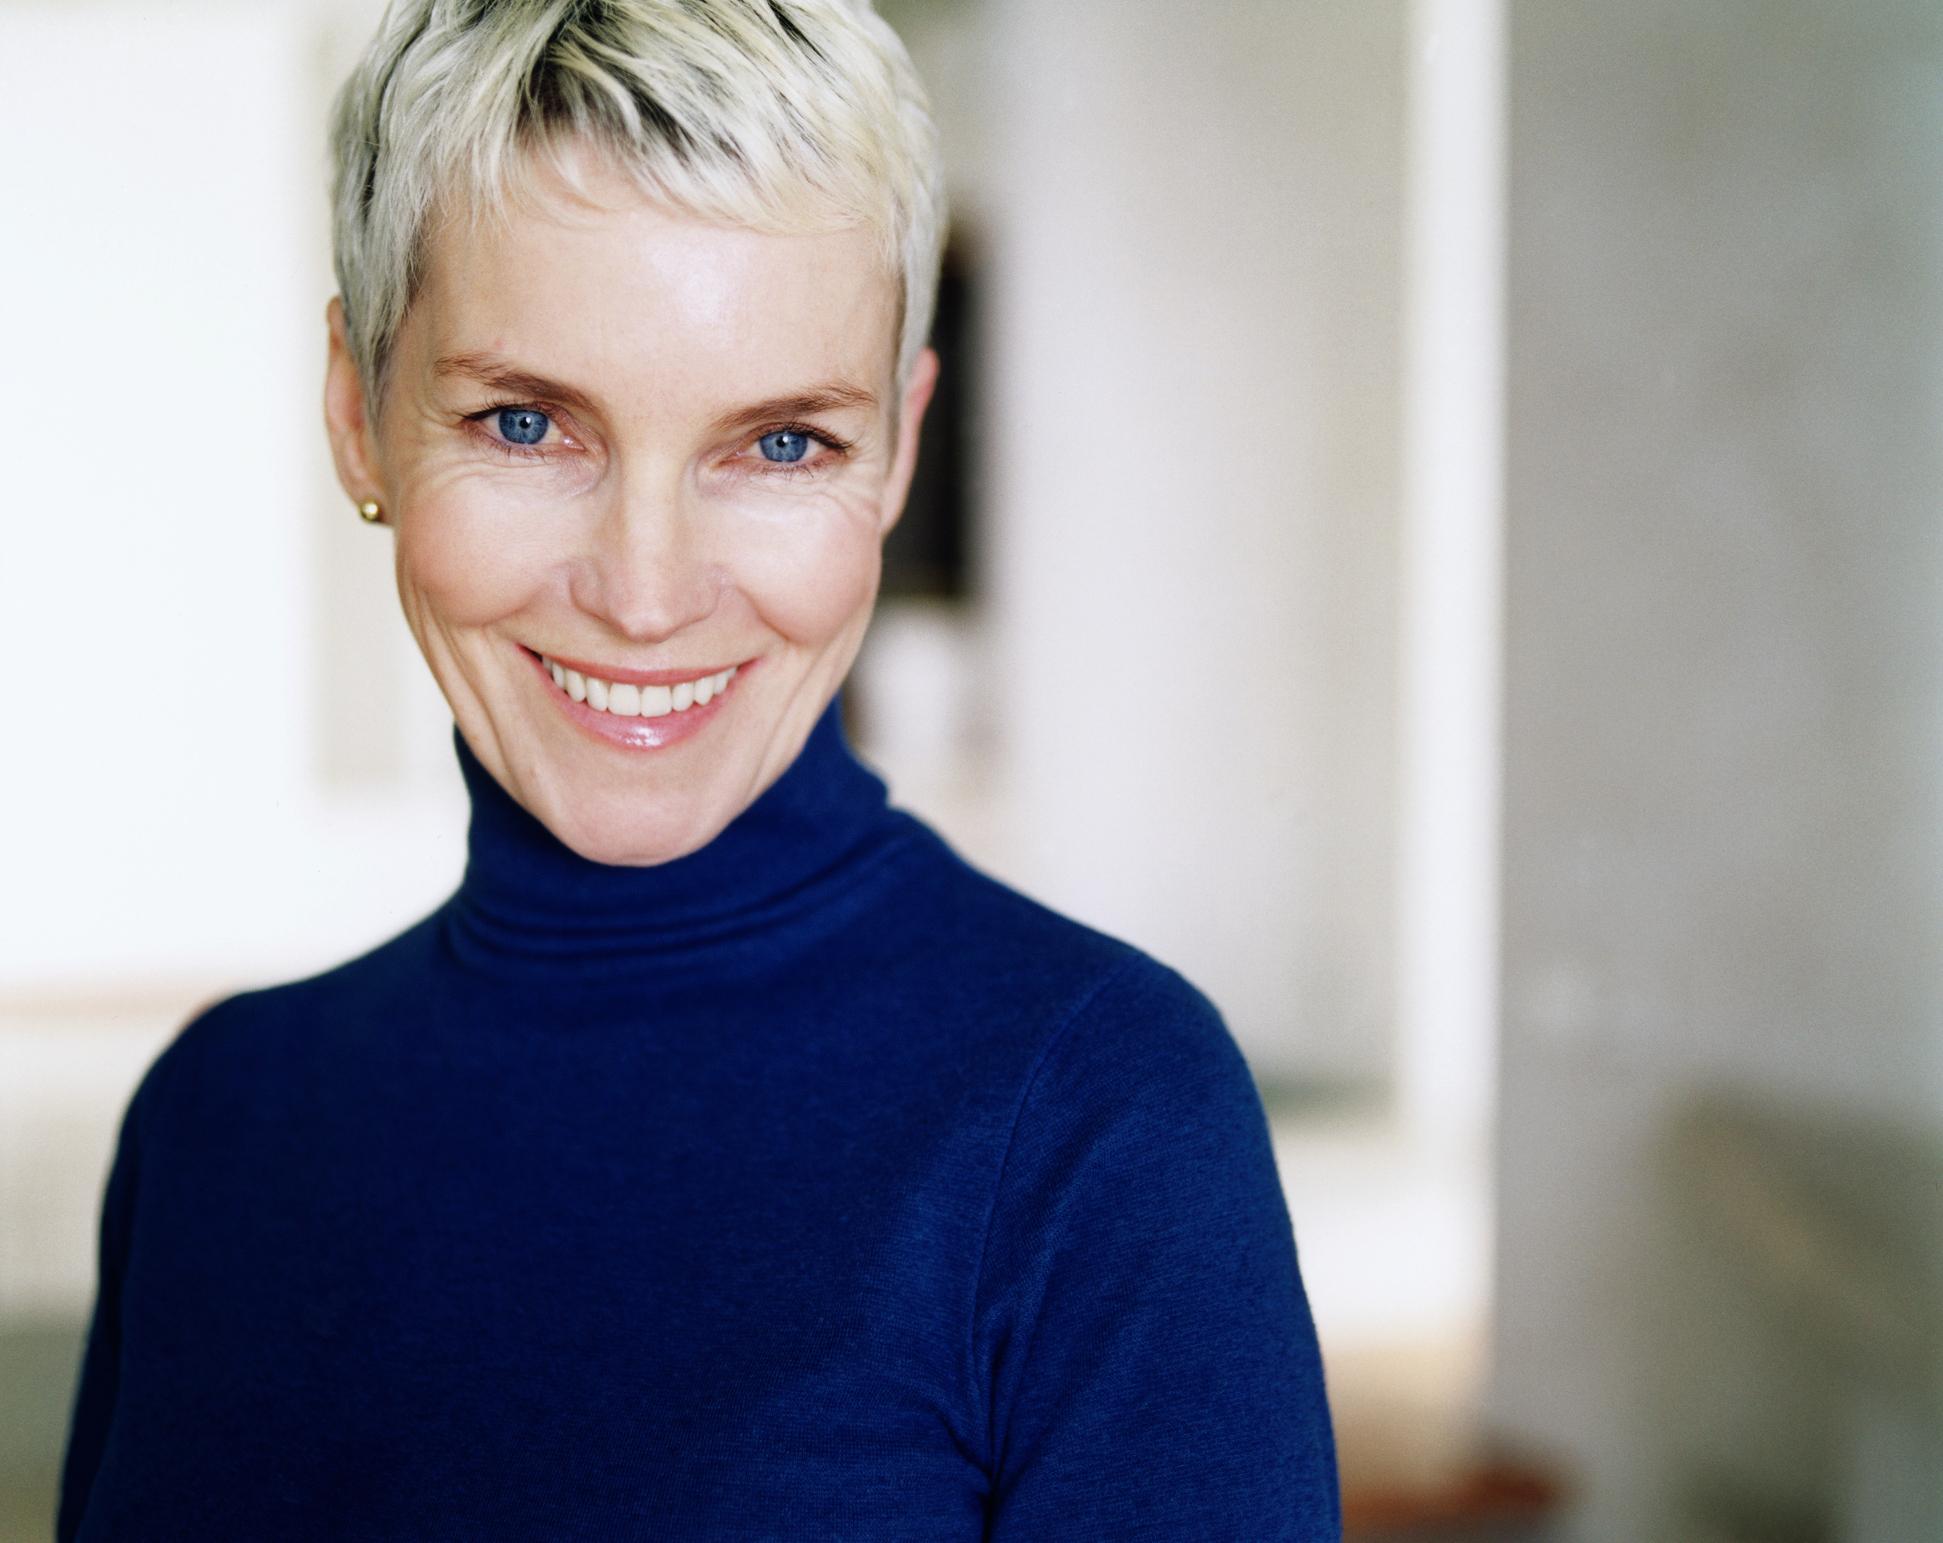 Mature woman wearing blue polo neck, portrait, close-up